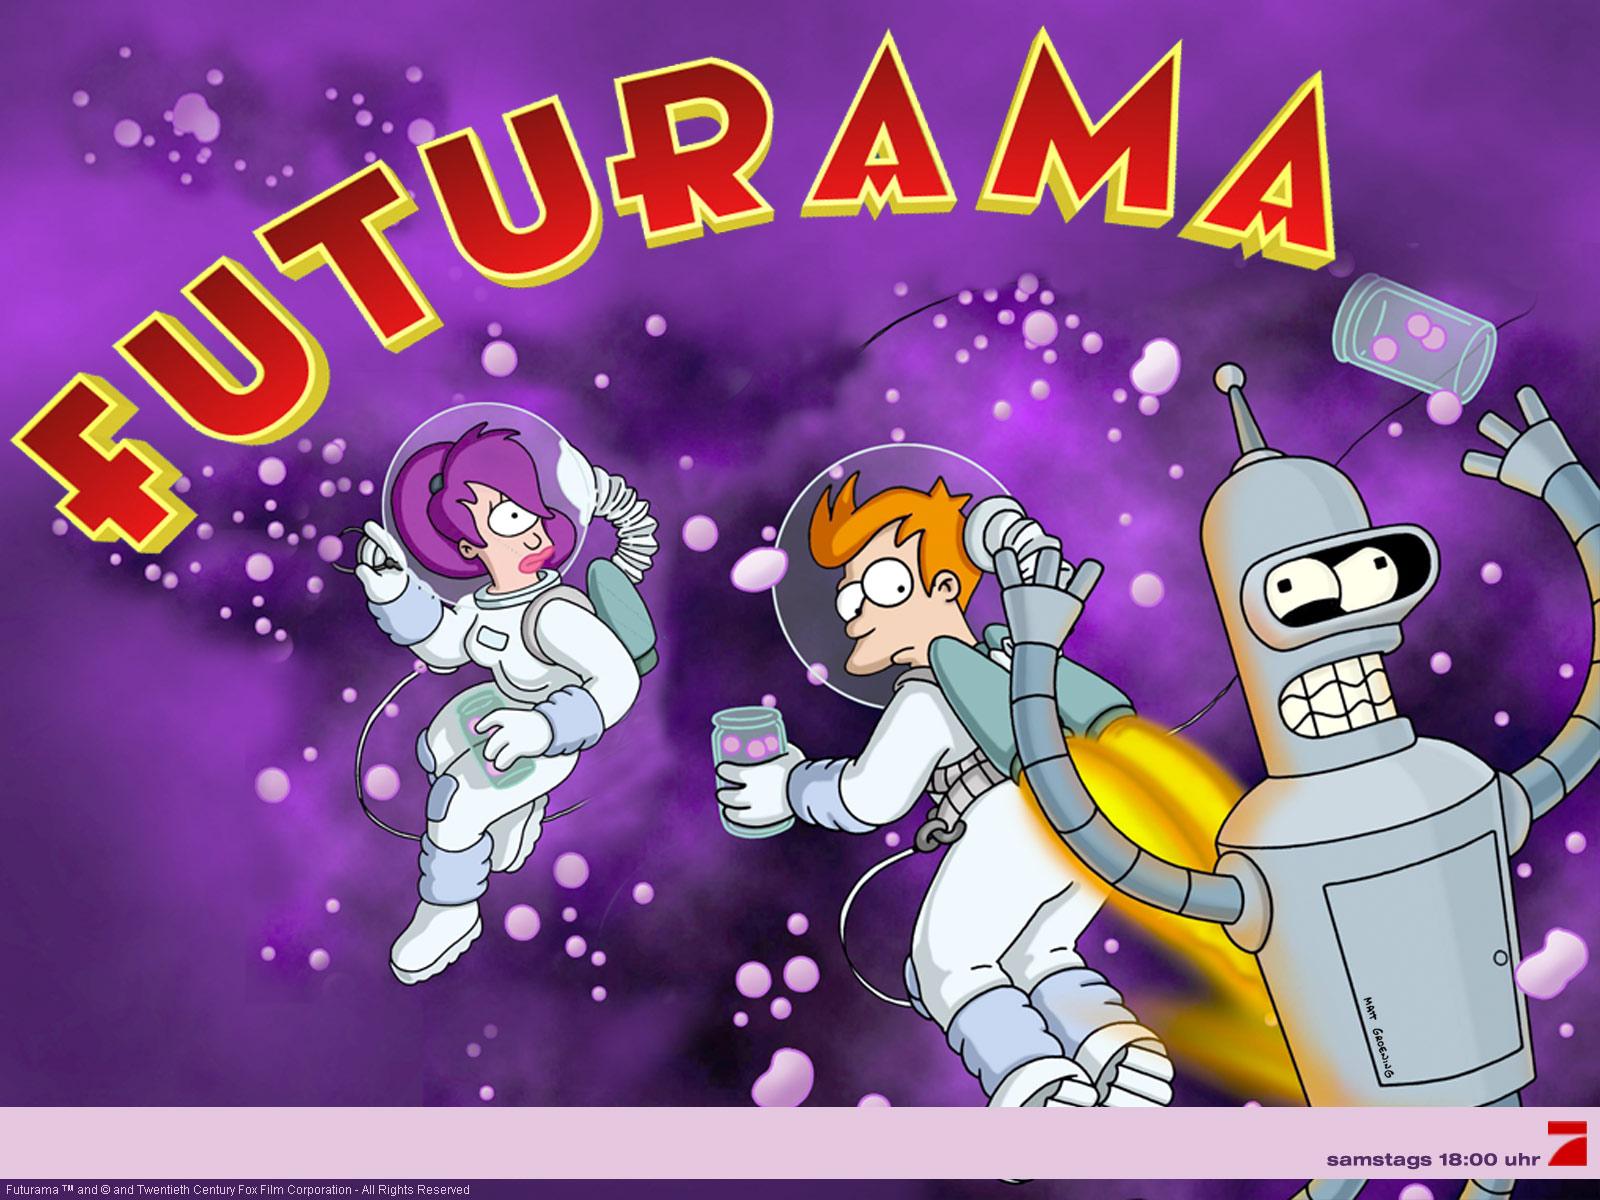 Futurama Wallpaper and Background Image | 1600x1200 | ID ...